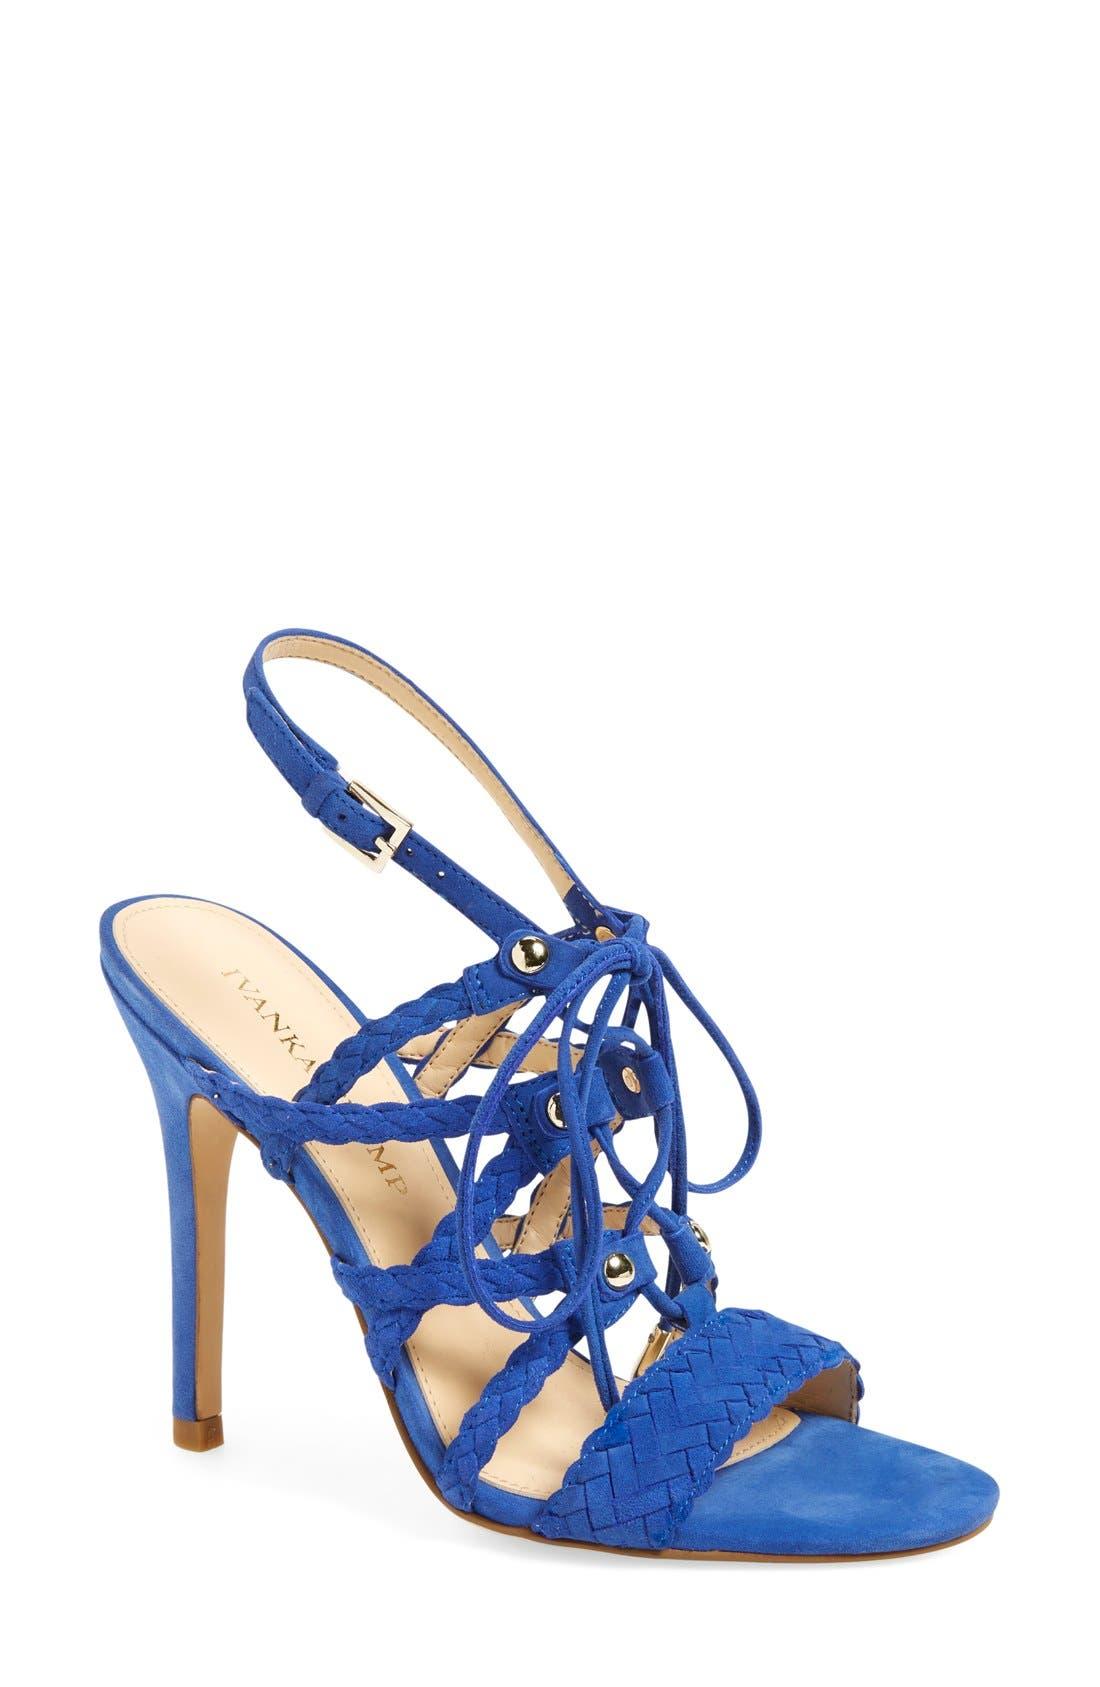 Alternate Image 1 Selected - Ivanka Trump 'Hera' Sandal (Women)